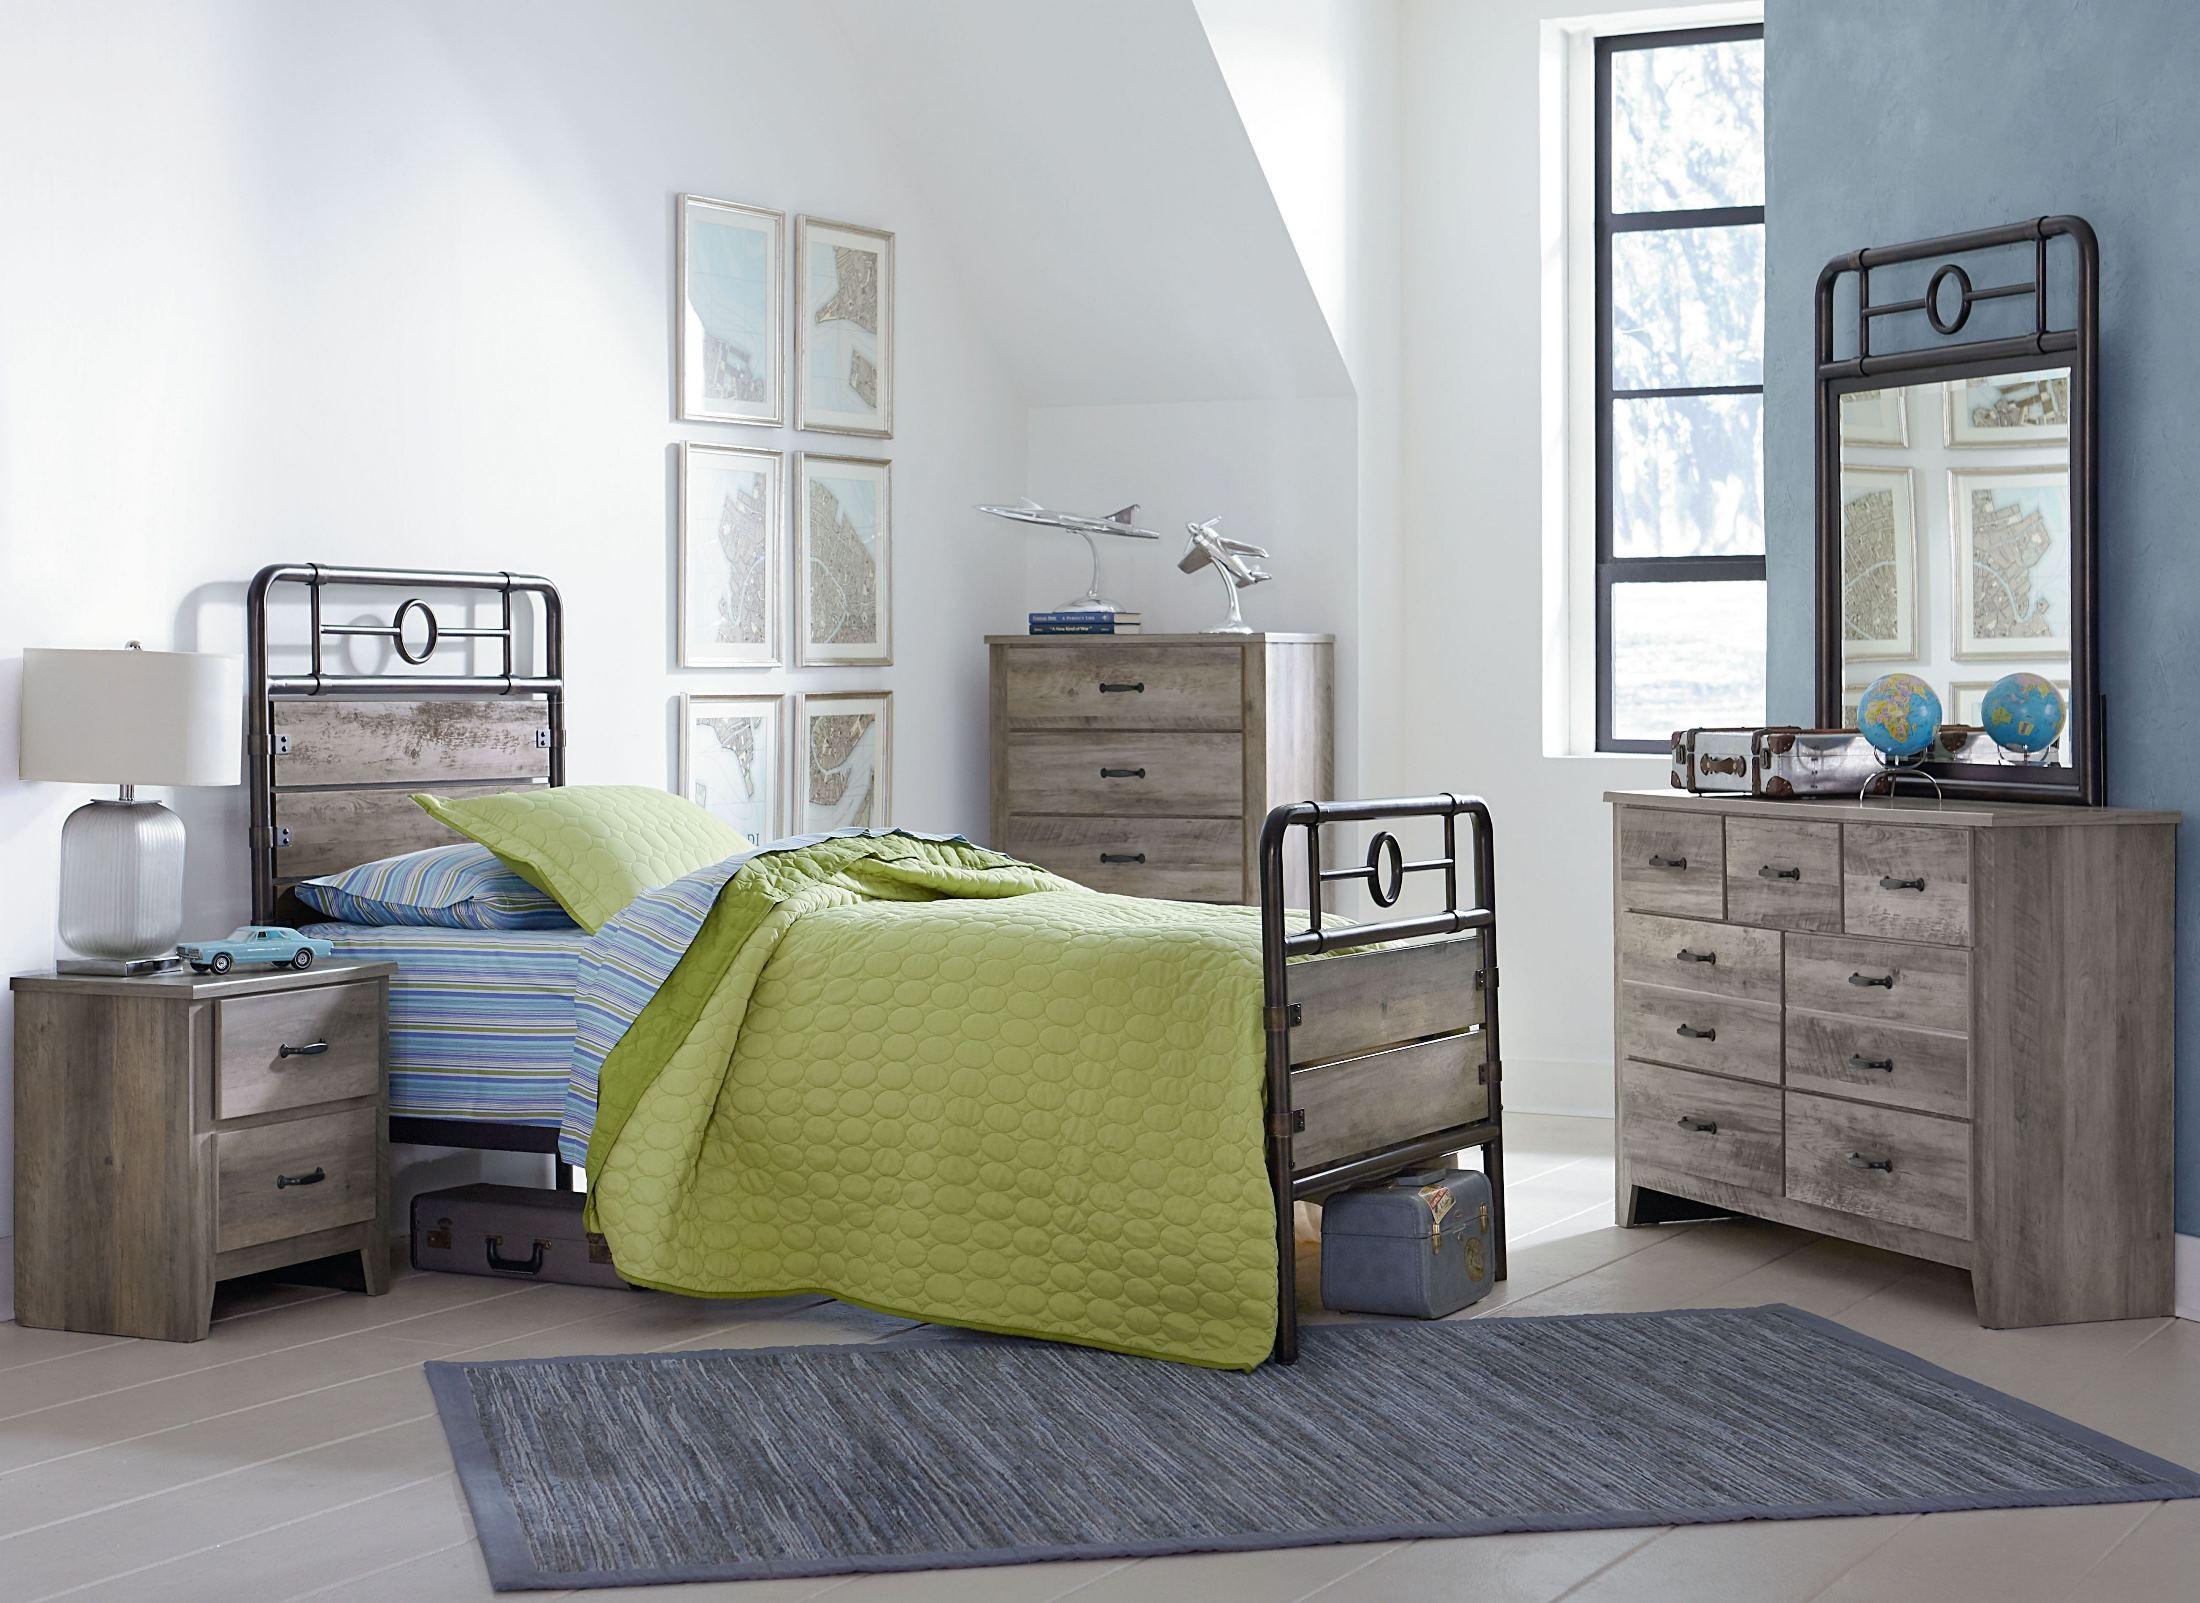 Barnett distressed pine youth metal bedroom set from standard furniture coleman furniture for Distressed pine bedroom furniture